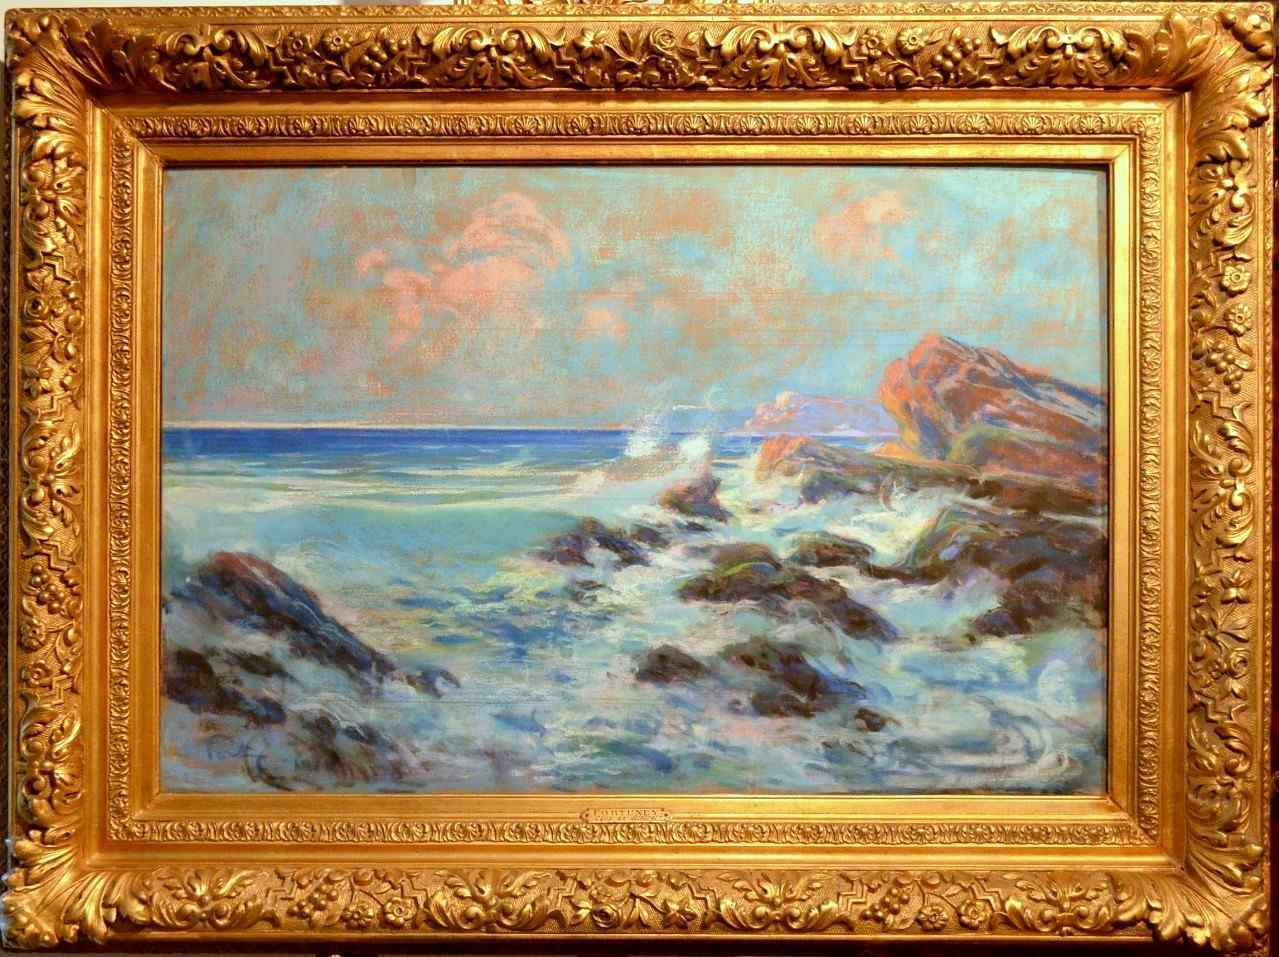 Scuola impressionista francese, Costa Azzurra